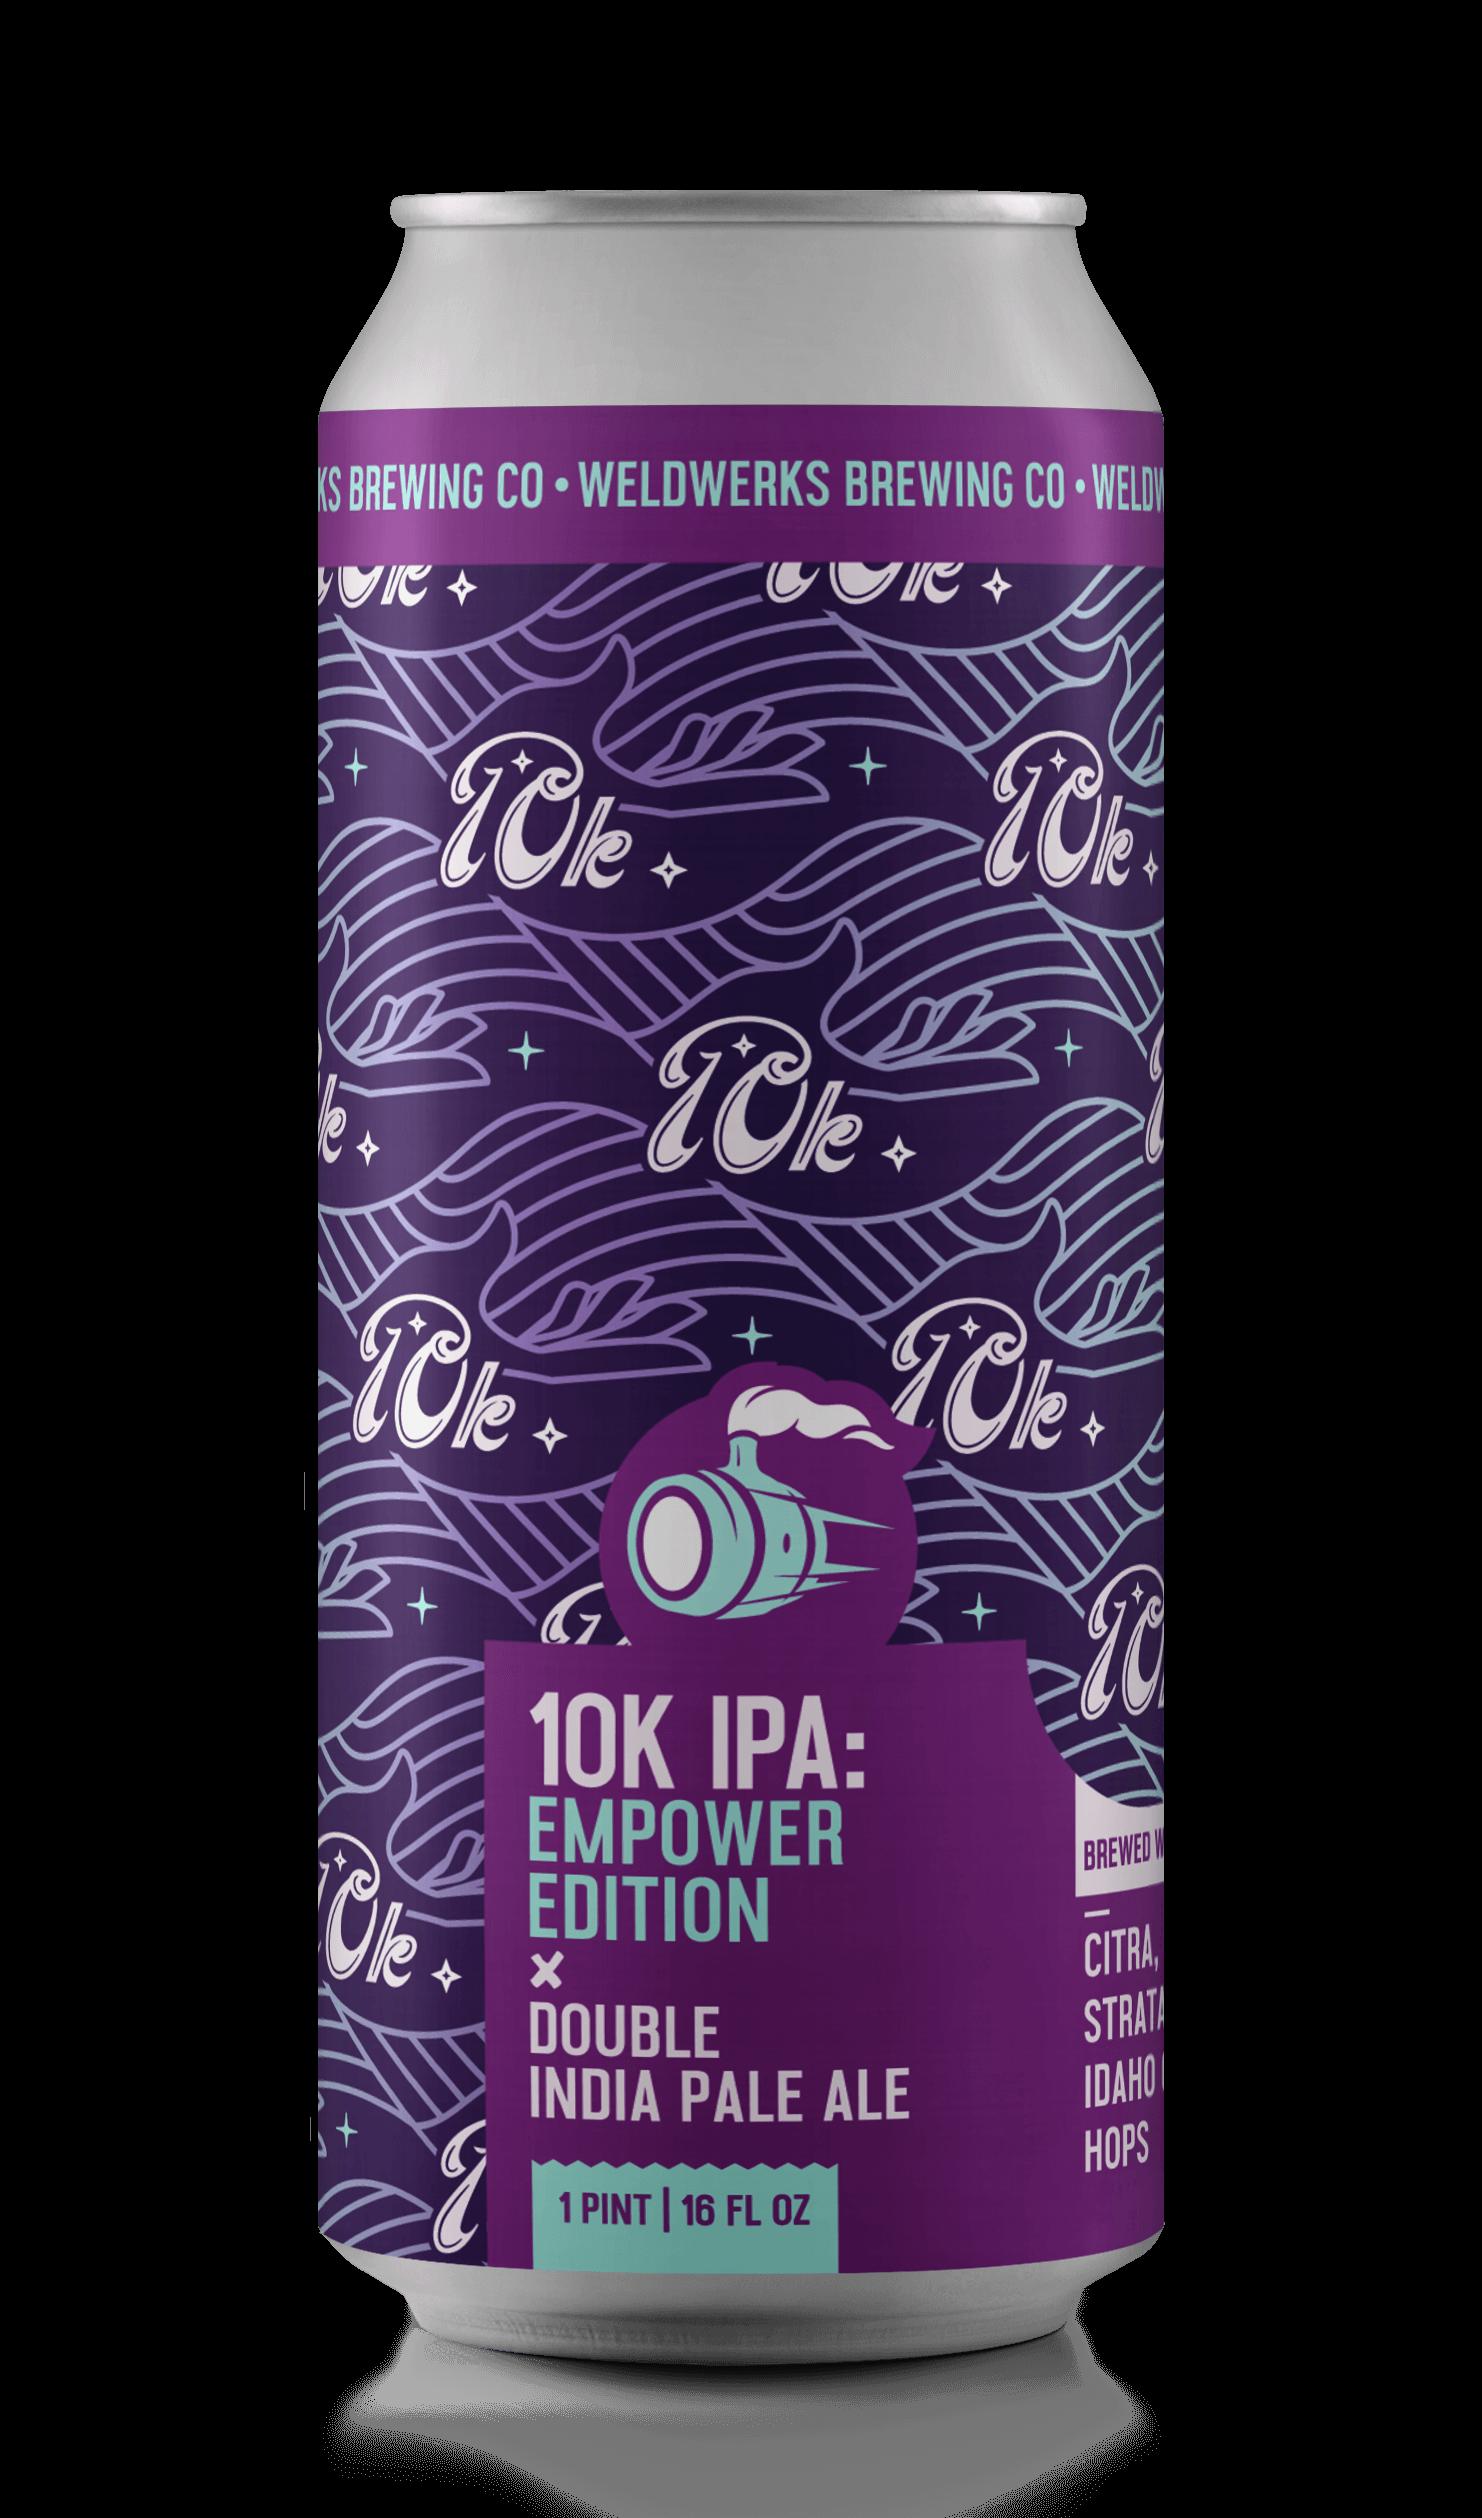 10K IPA Empower Edition